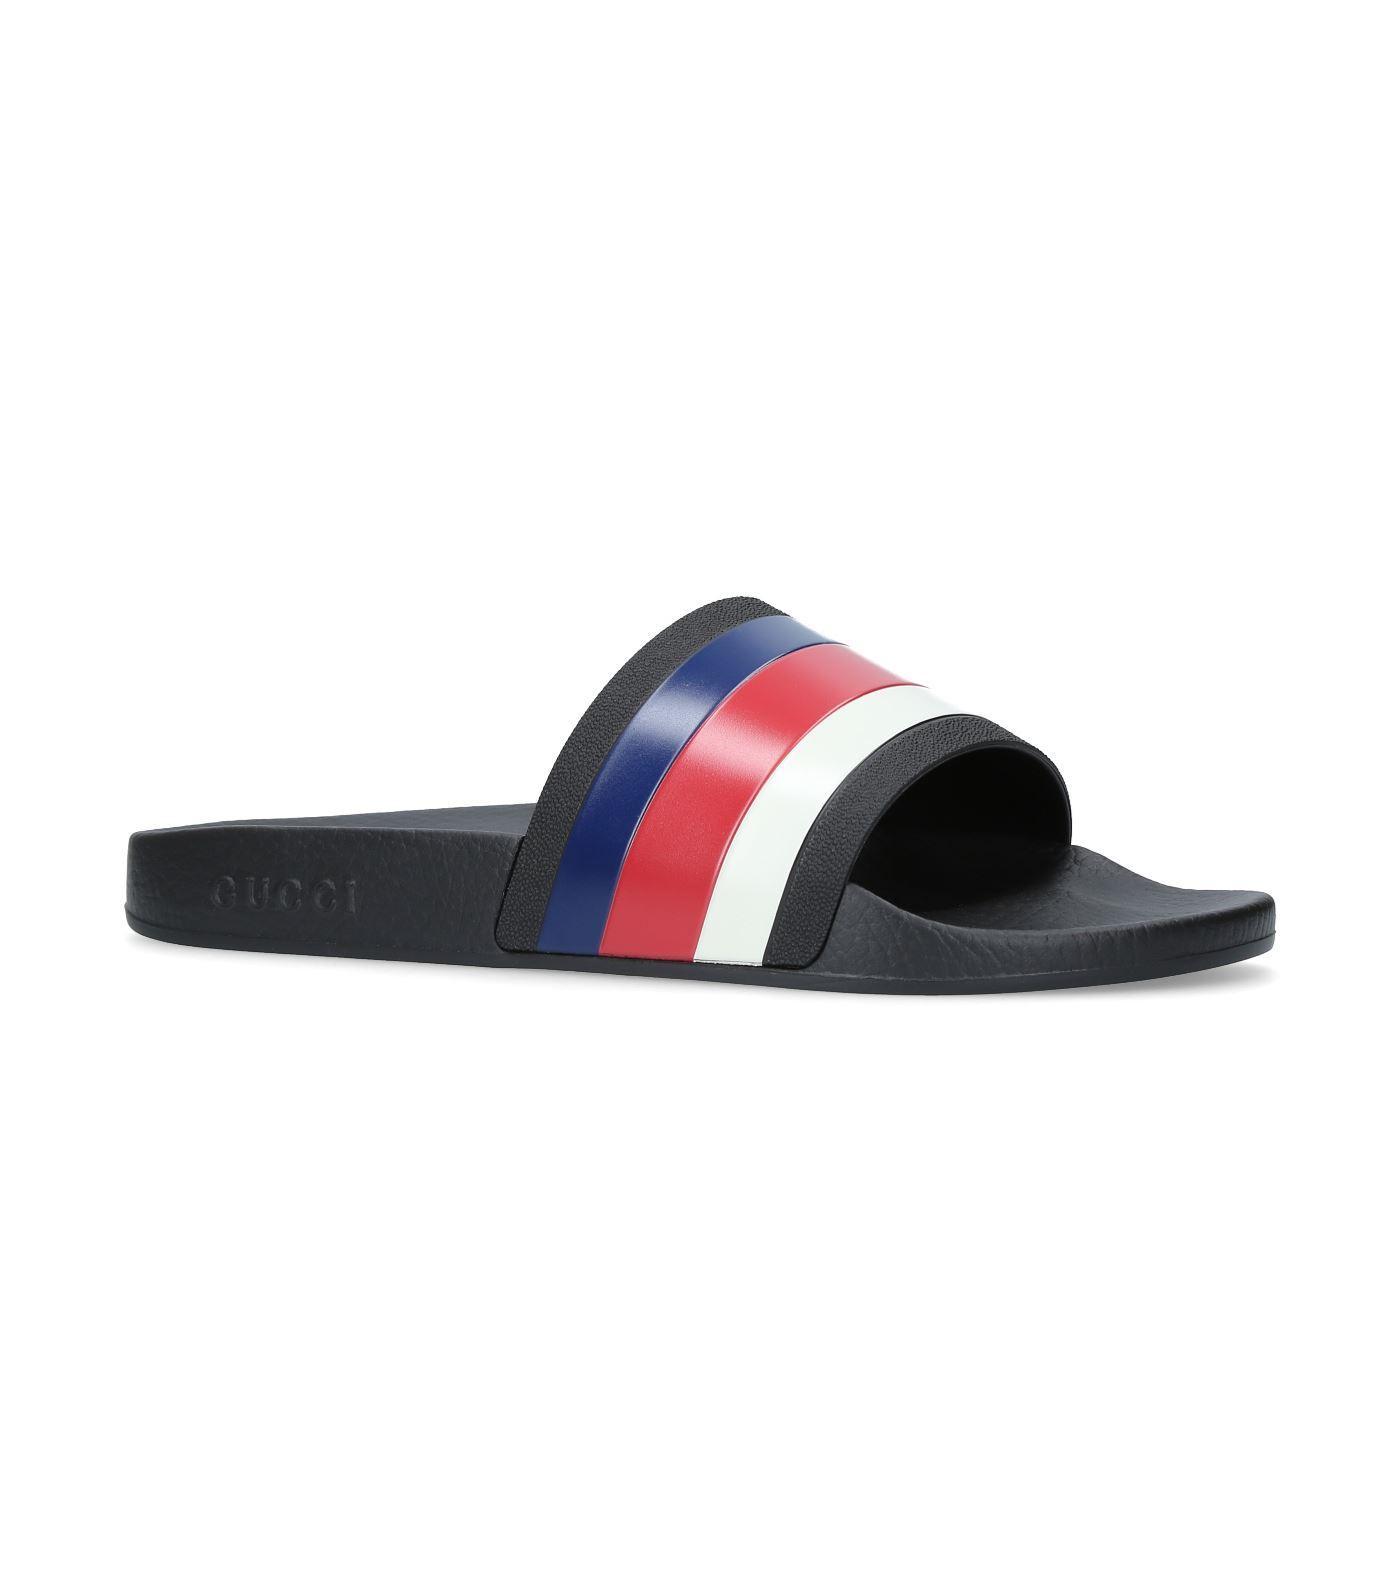 f2a0c1b8ab90 Gucci Pursuit  72 Rubber Slide Sandal In 1071 Black Navy